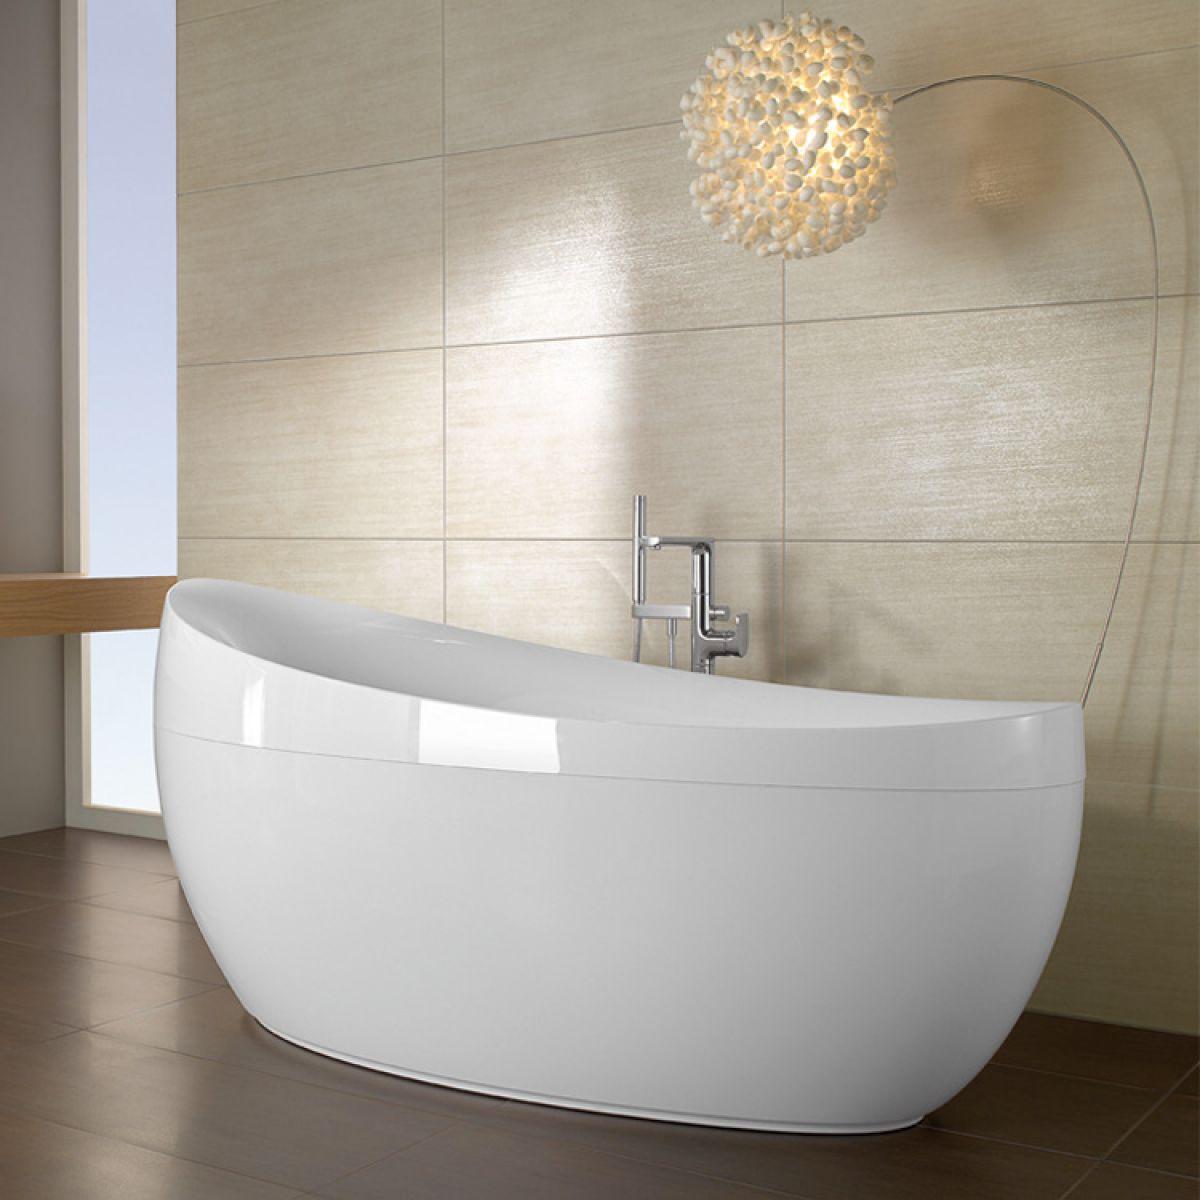 Villeroy & Boch Aveo Freestanding Oval Bath : UK Bathrooms